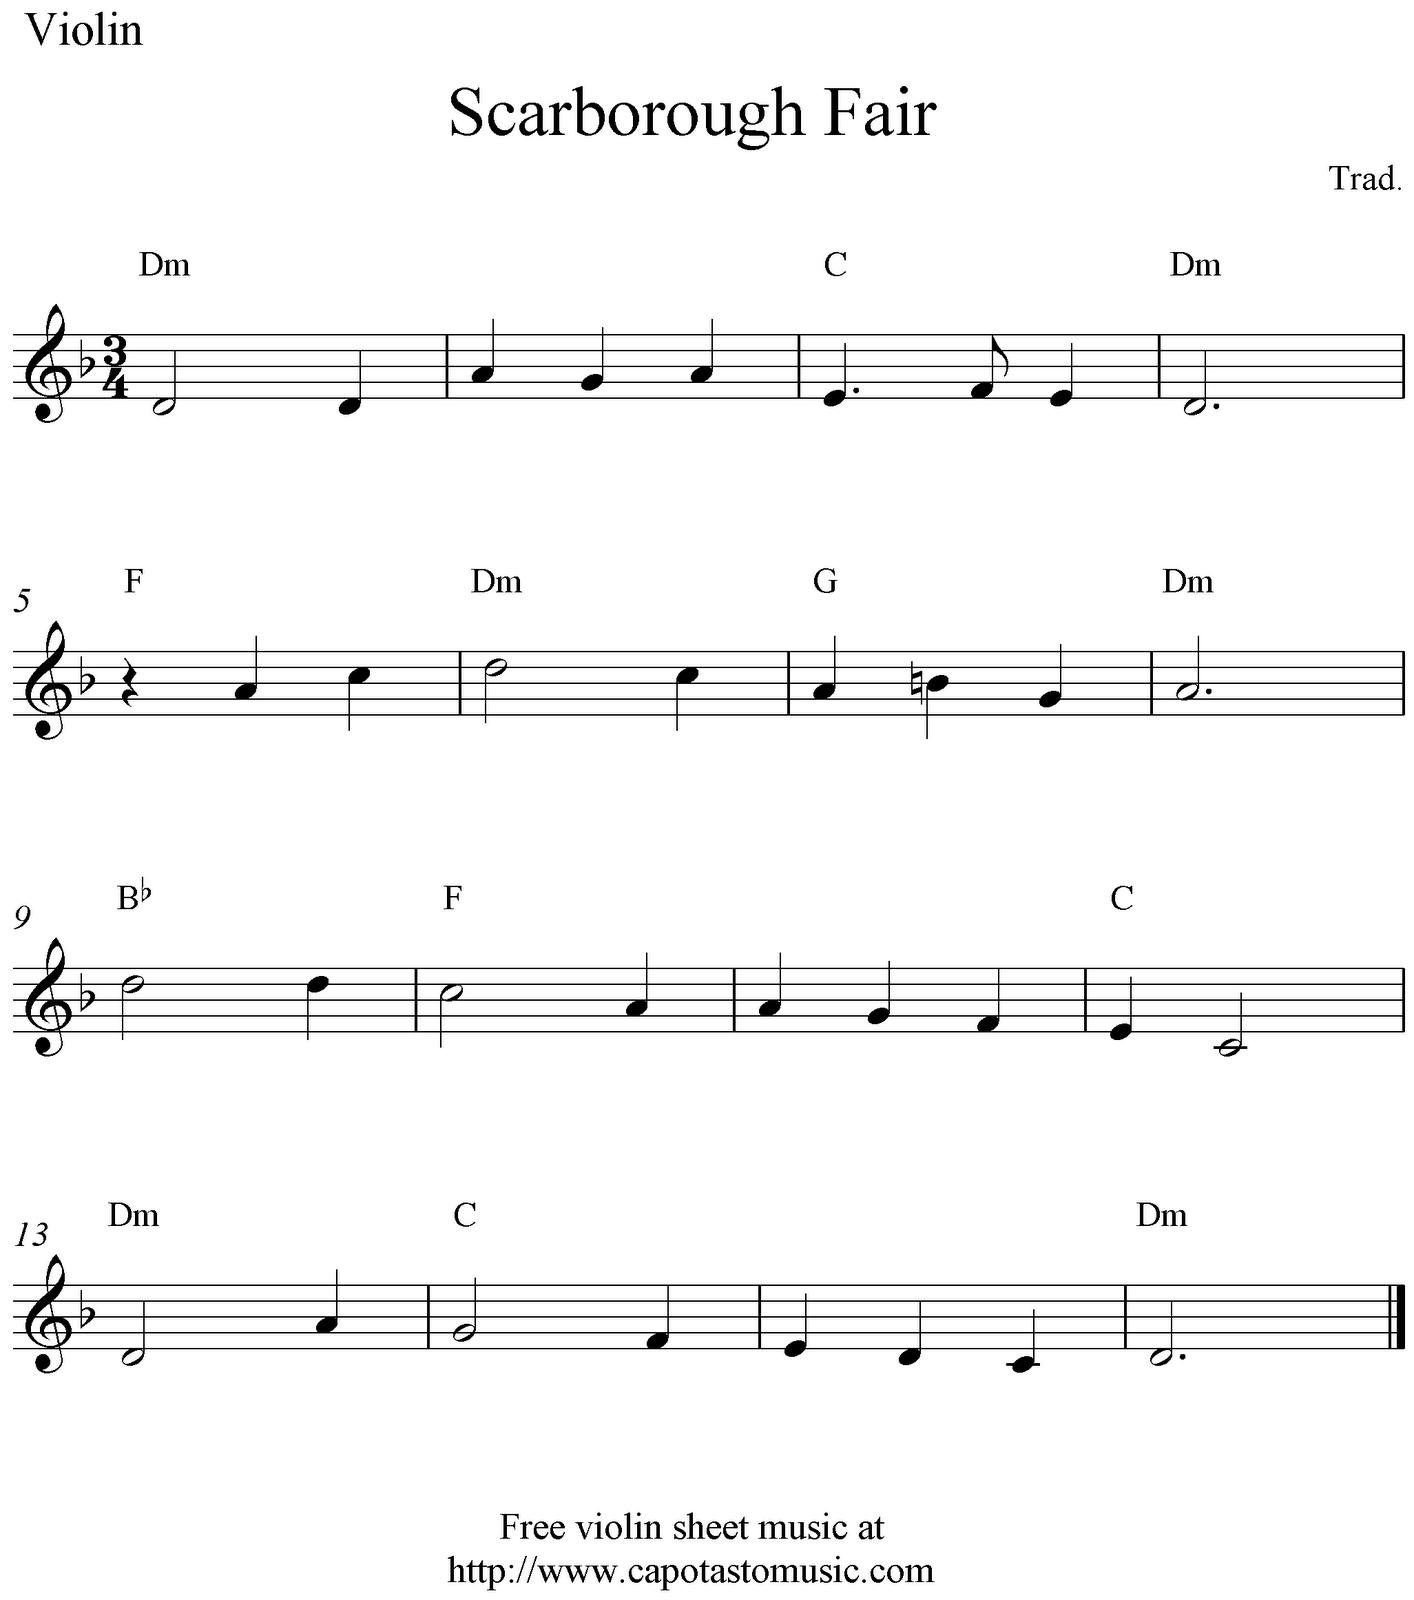 Free Easy Piano Sheet Music Score Scarborough Fair: Scarborough Fair, Free Violin Sheet Music Notes